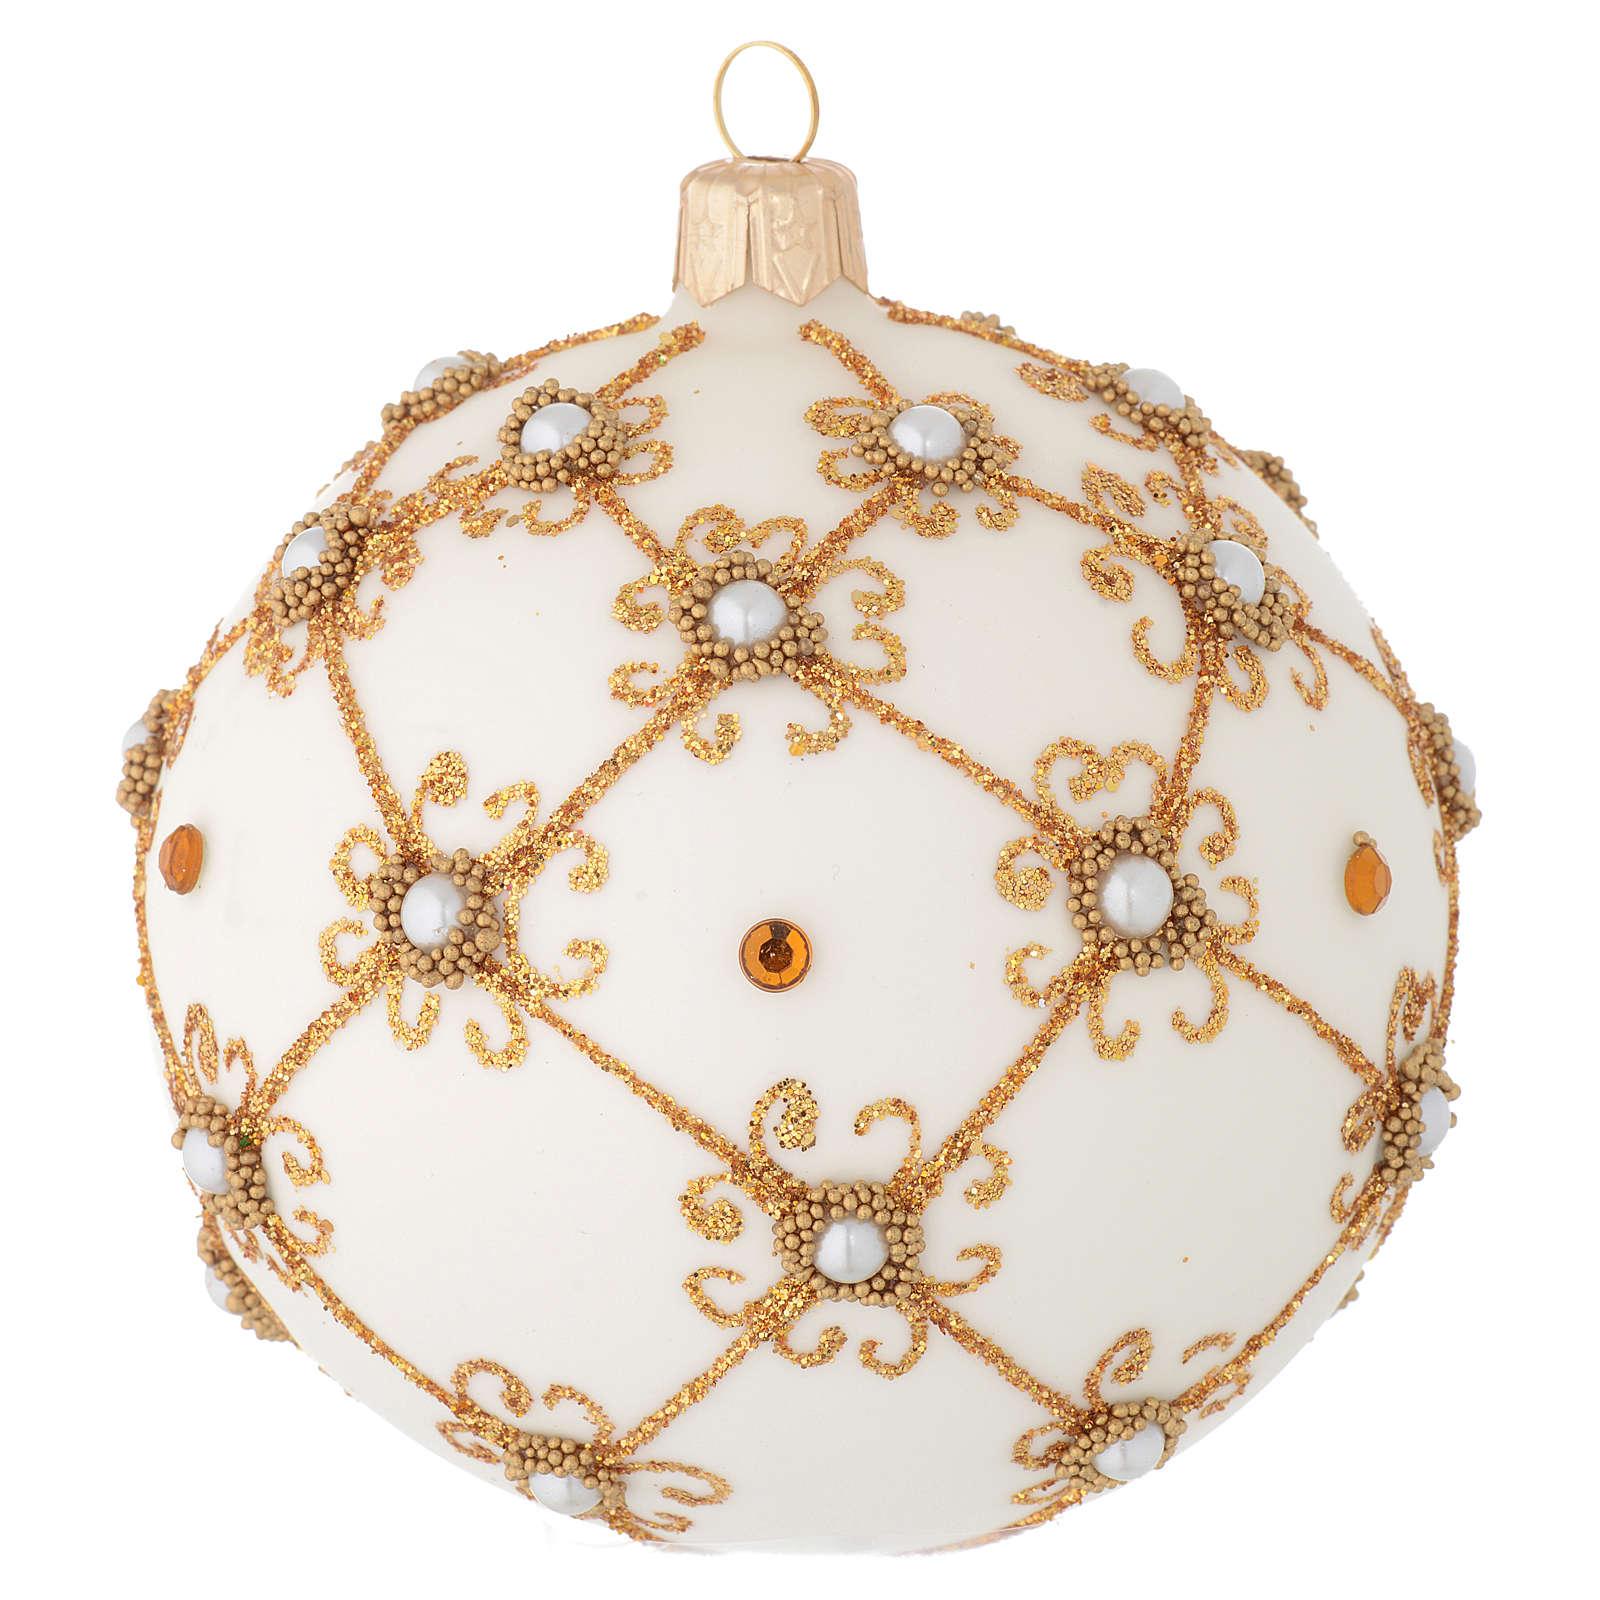 Pallina vetro soffiato avorio e oro 100 mm 4